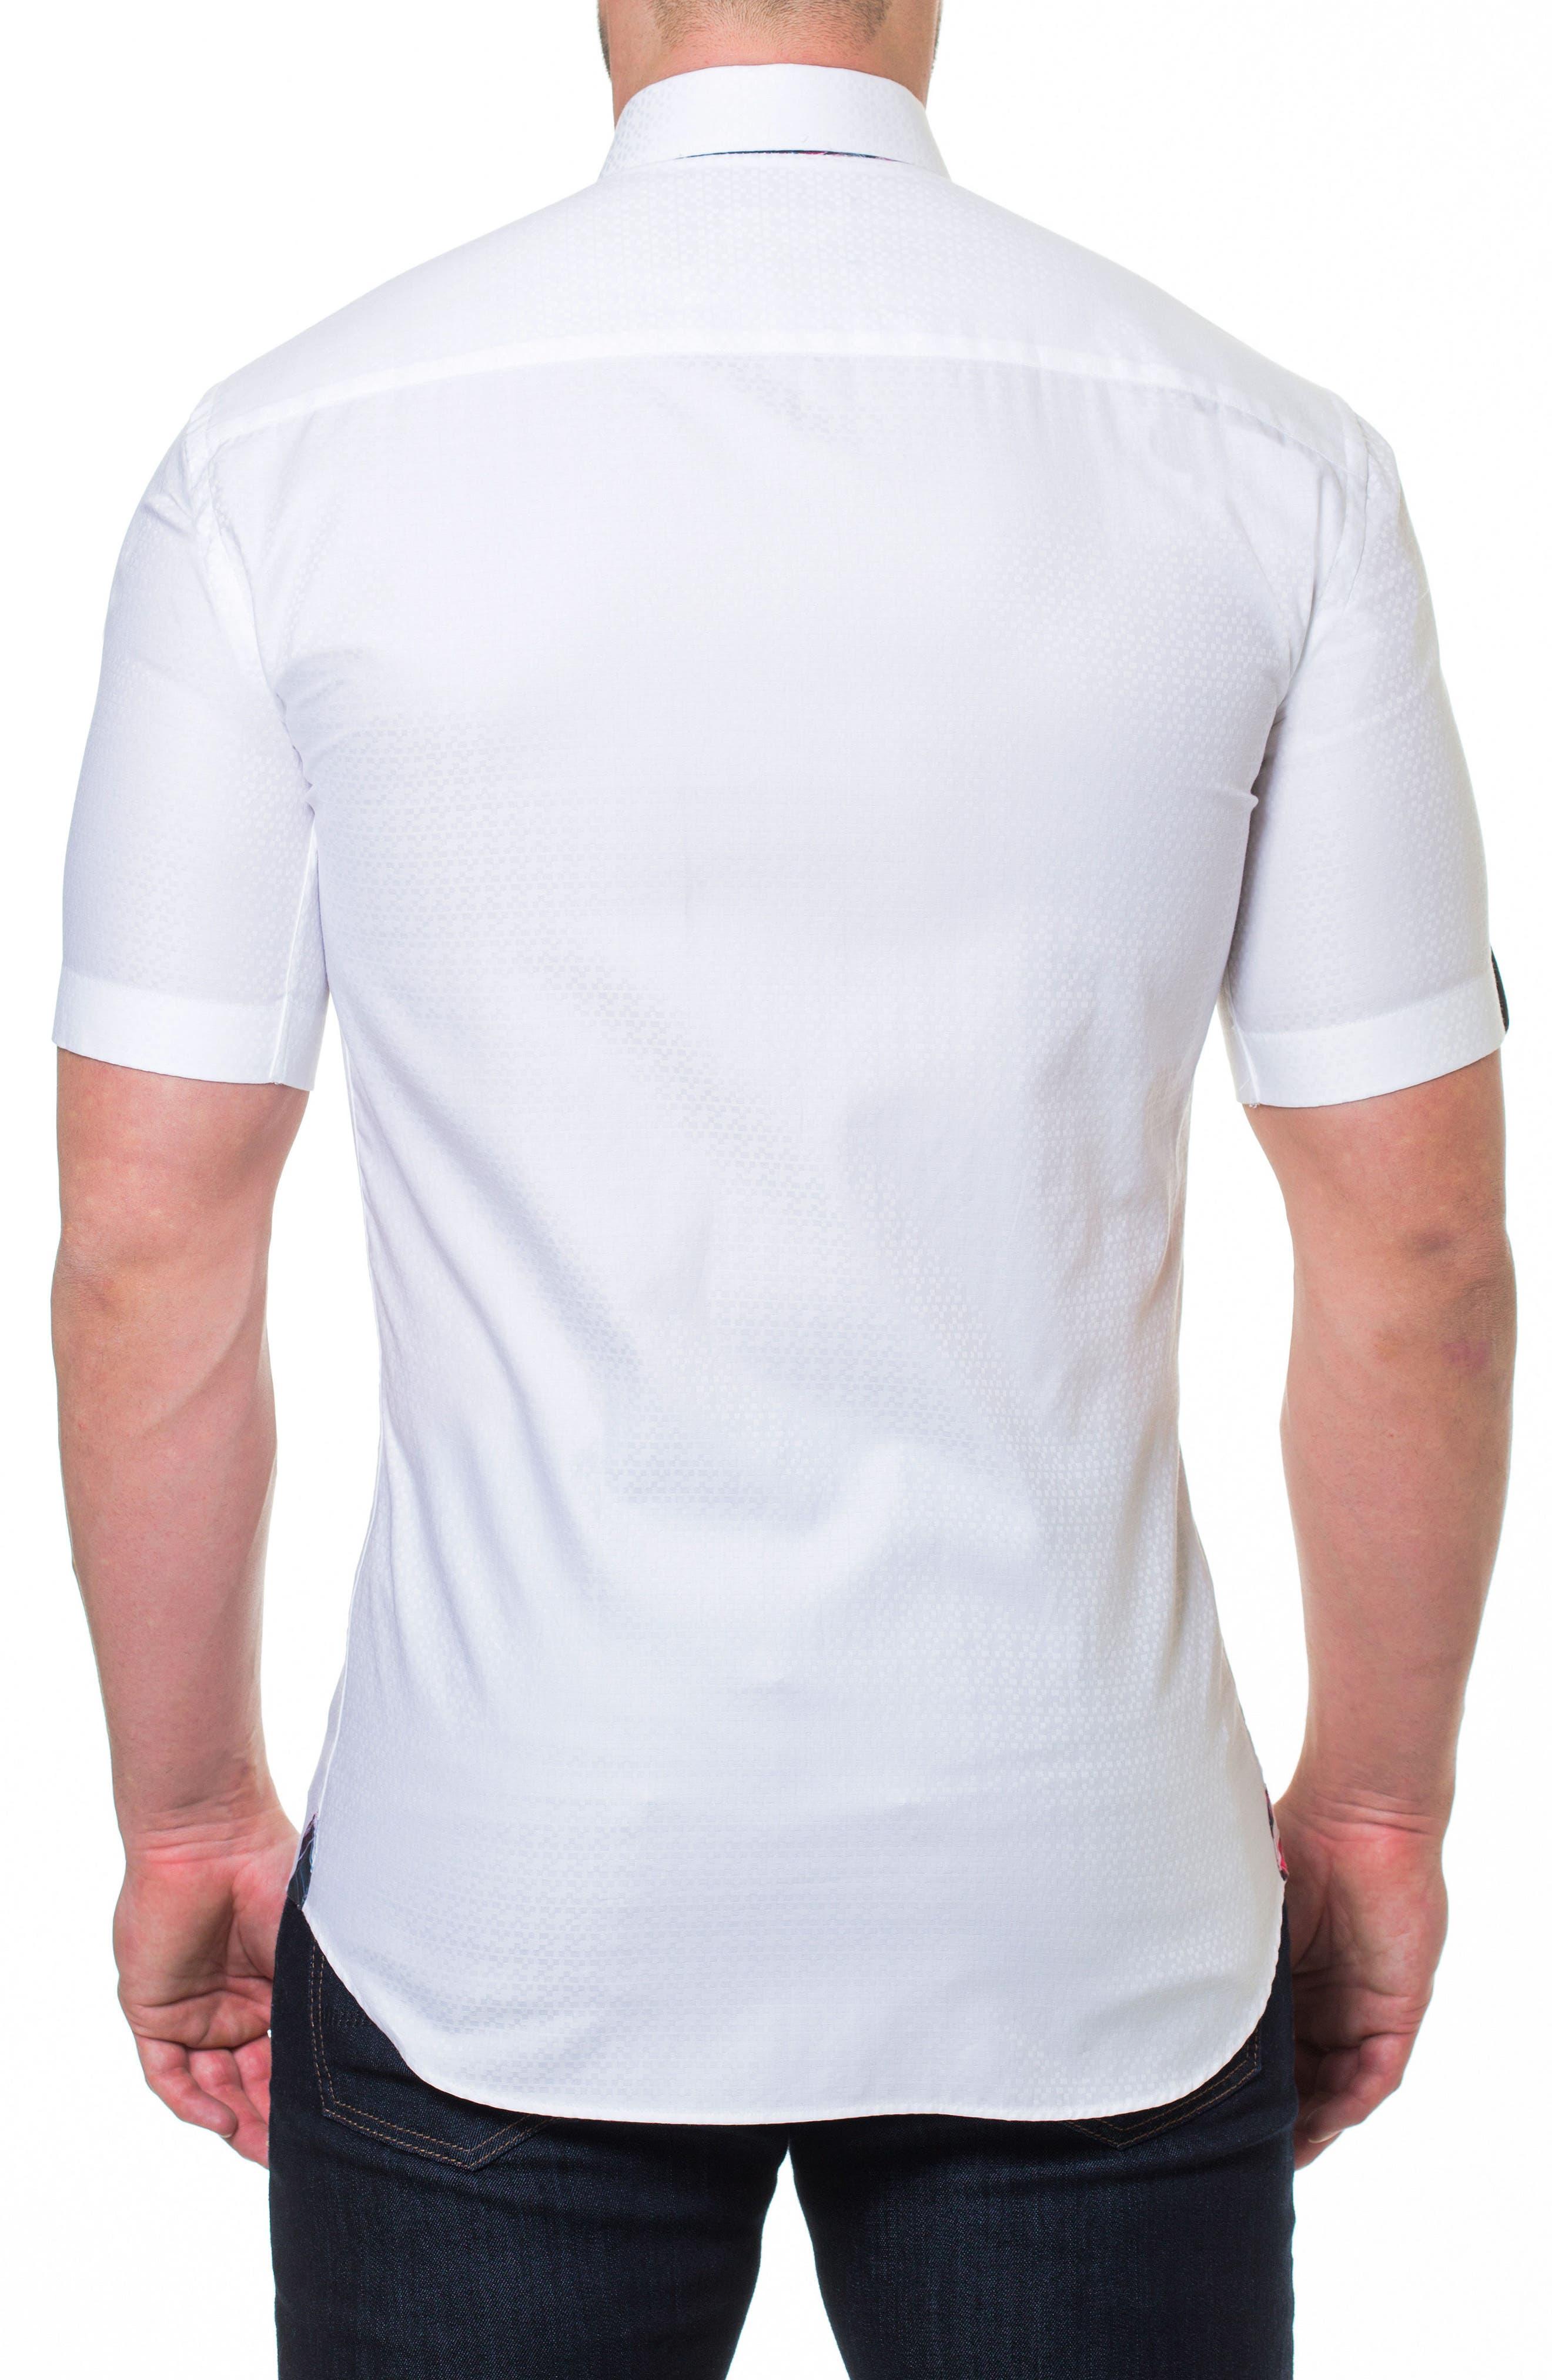 Fresh Block Sport Shirt,                             Alternate thumbnail 2, color,                             White